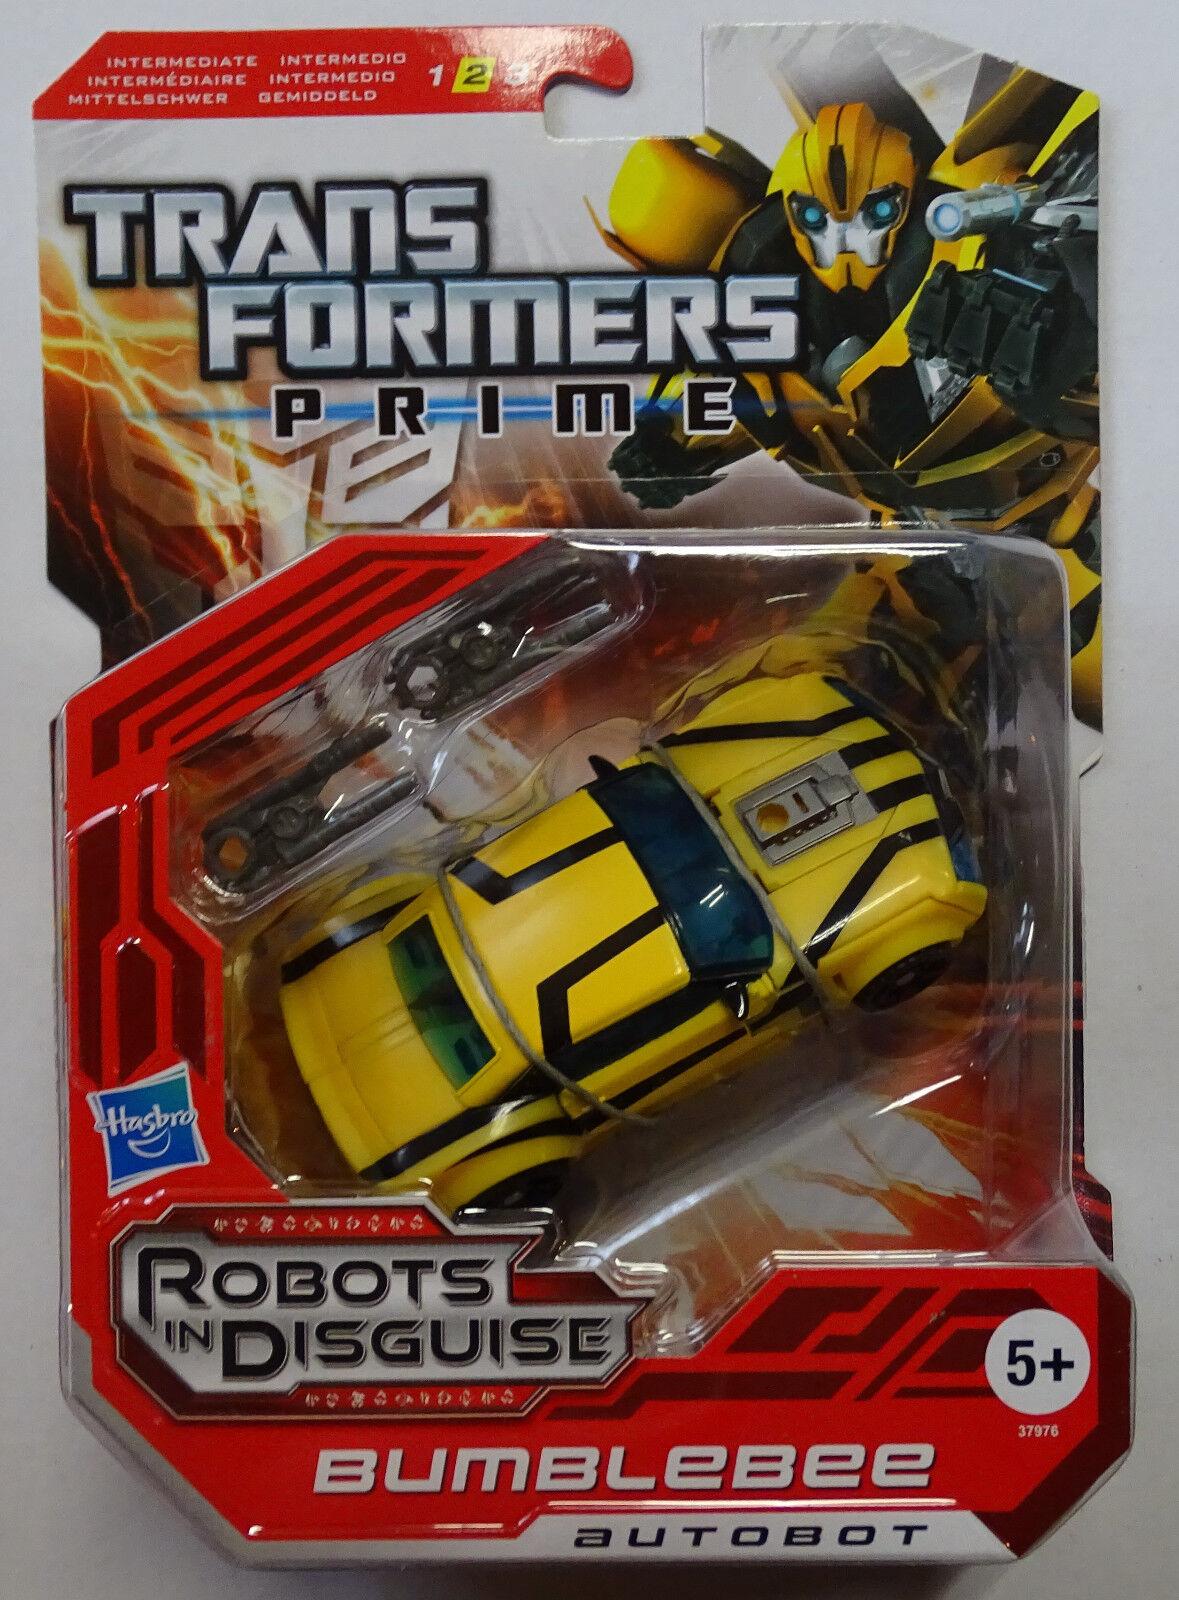 HASBRO® 37976 Transformers RID Prime Deluxe Autobot Bumblebee (2011)